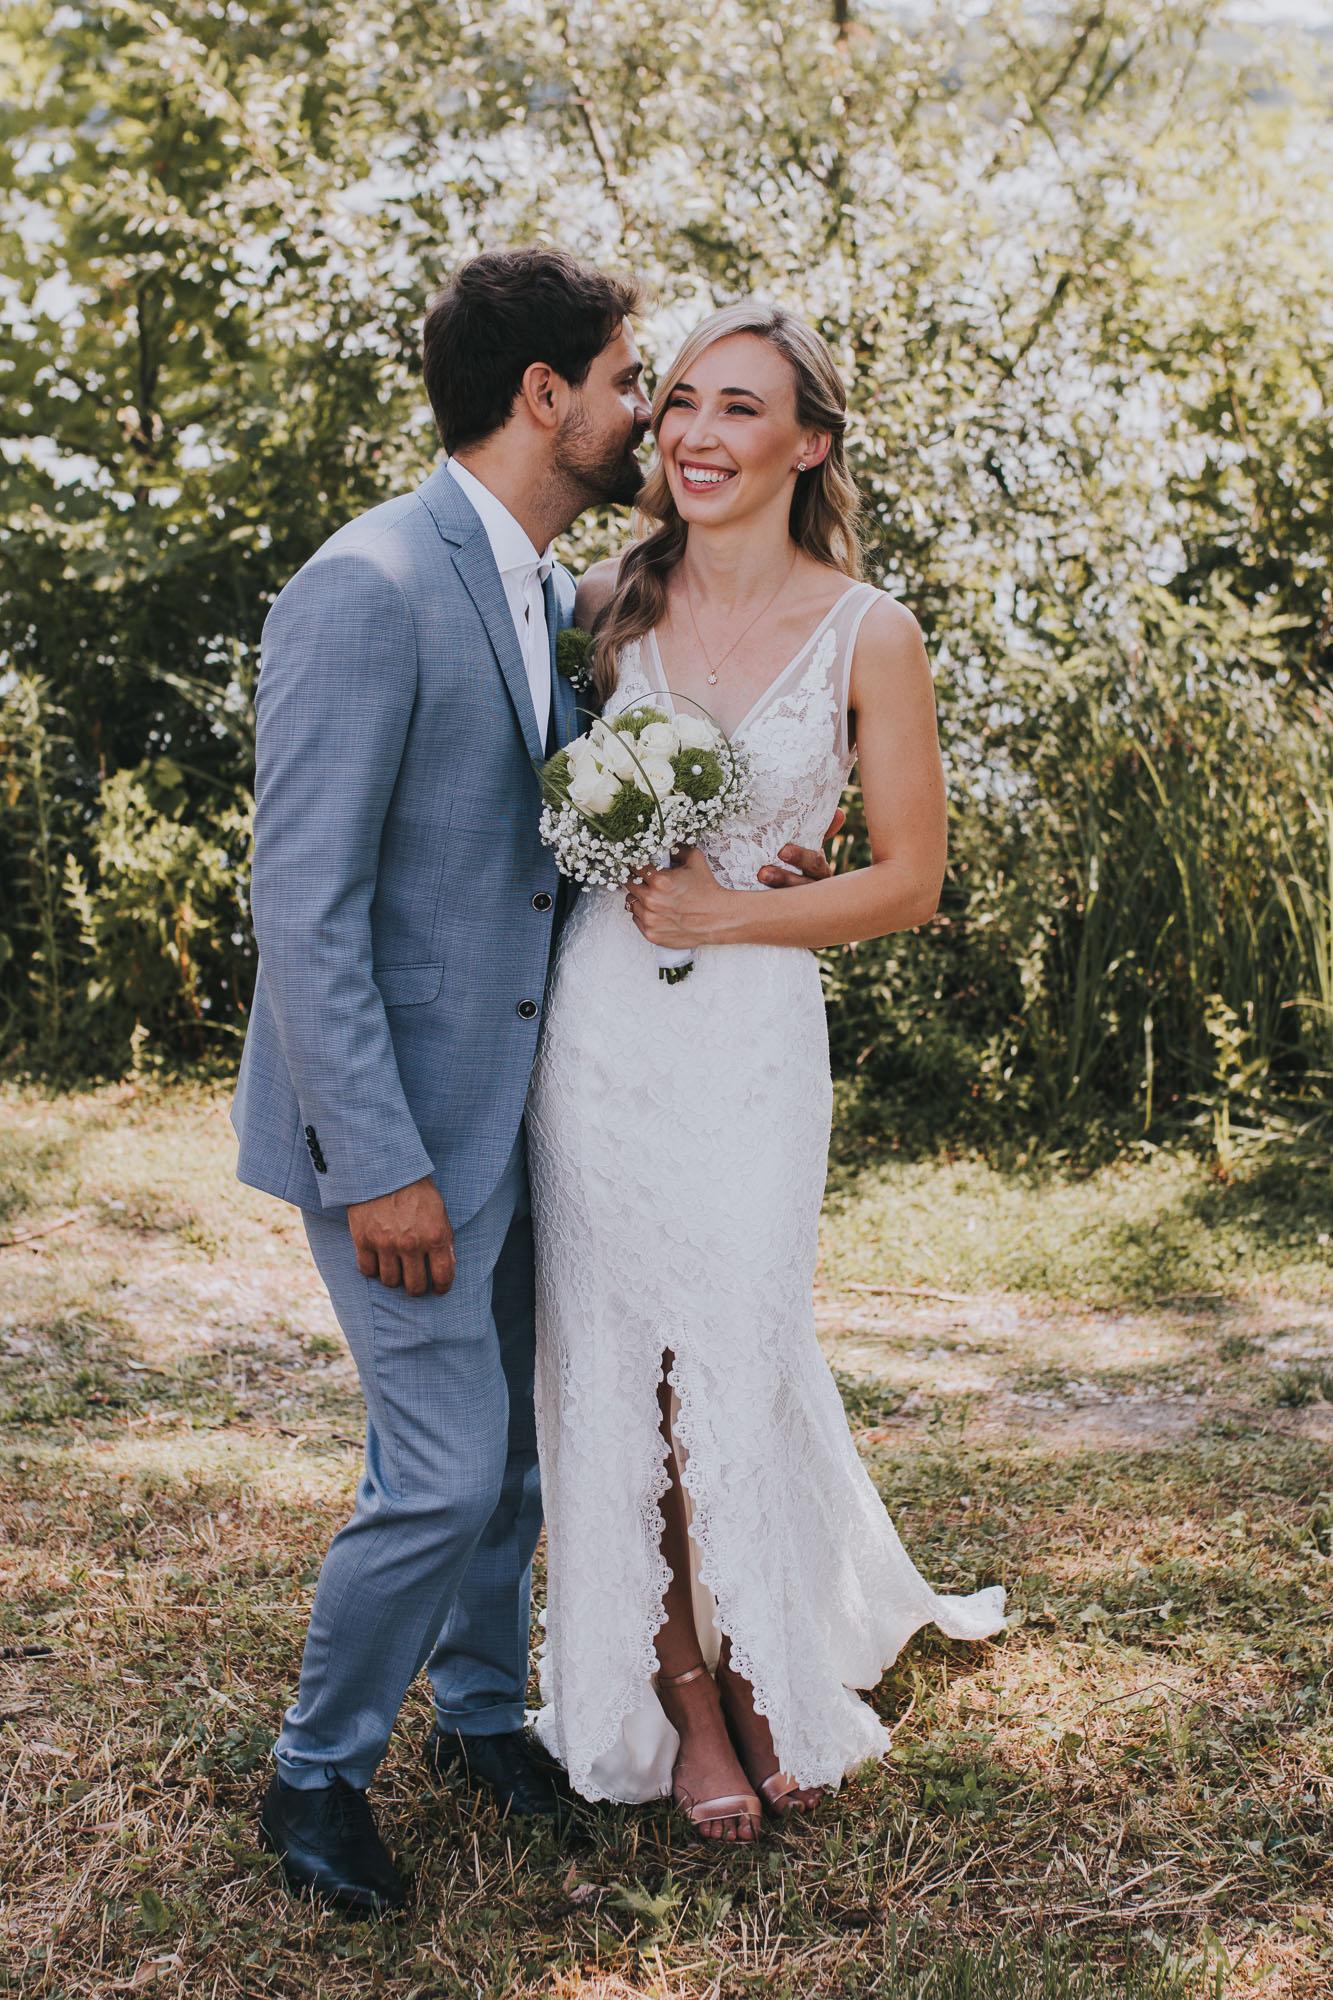 20180720-Memoryfactory-Sara&Jacopo-22- Hochzeit.jpg